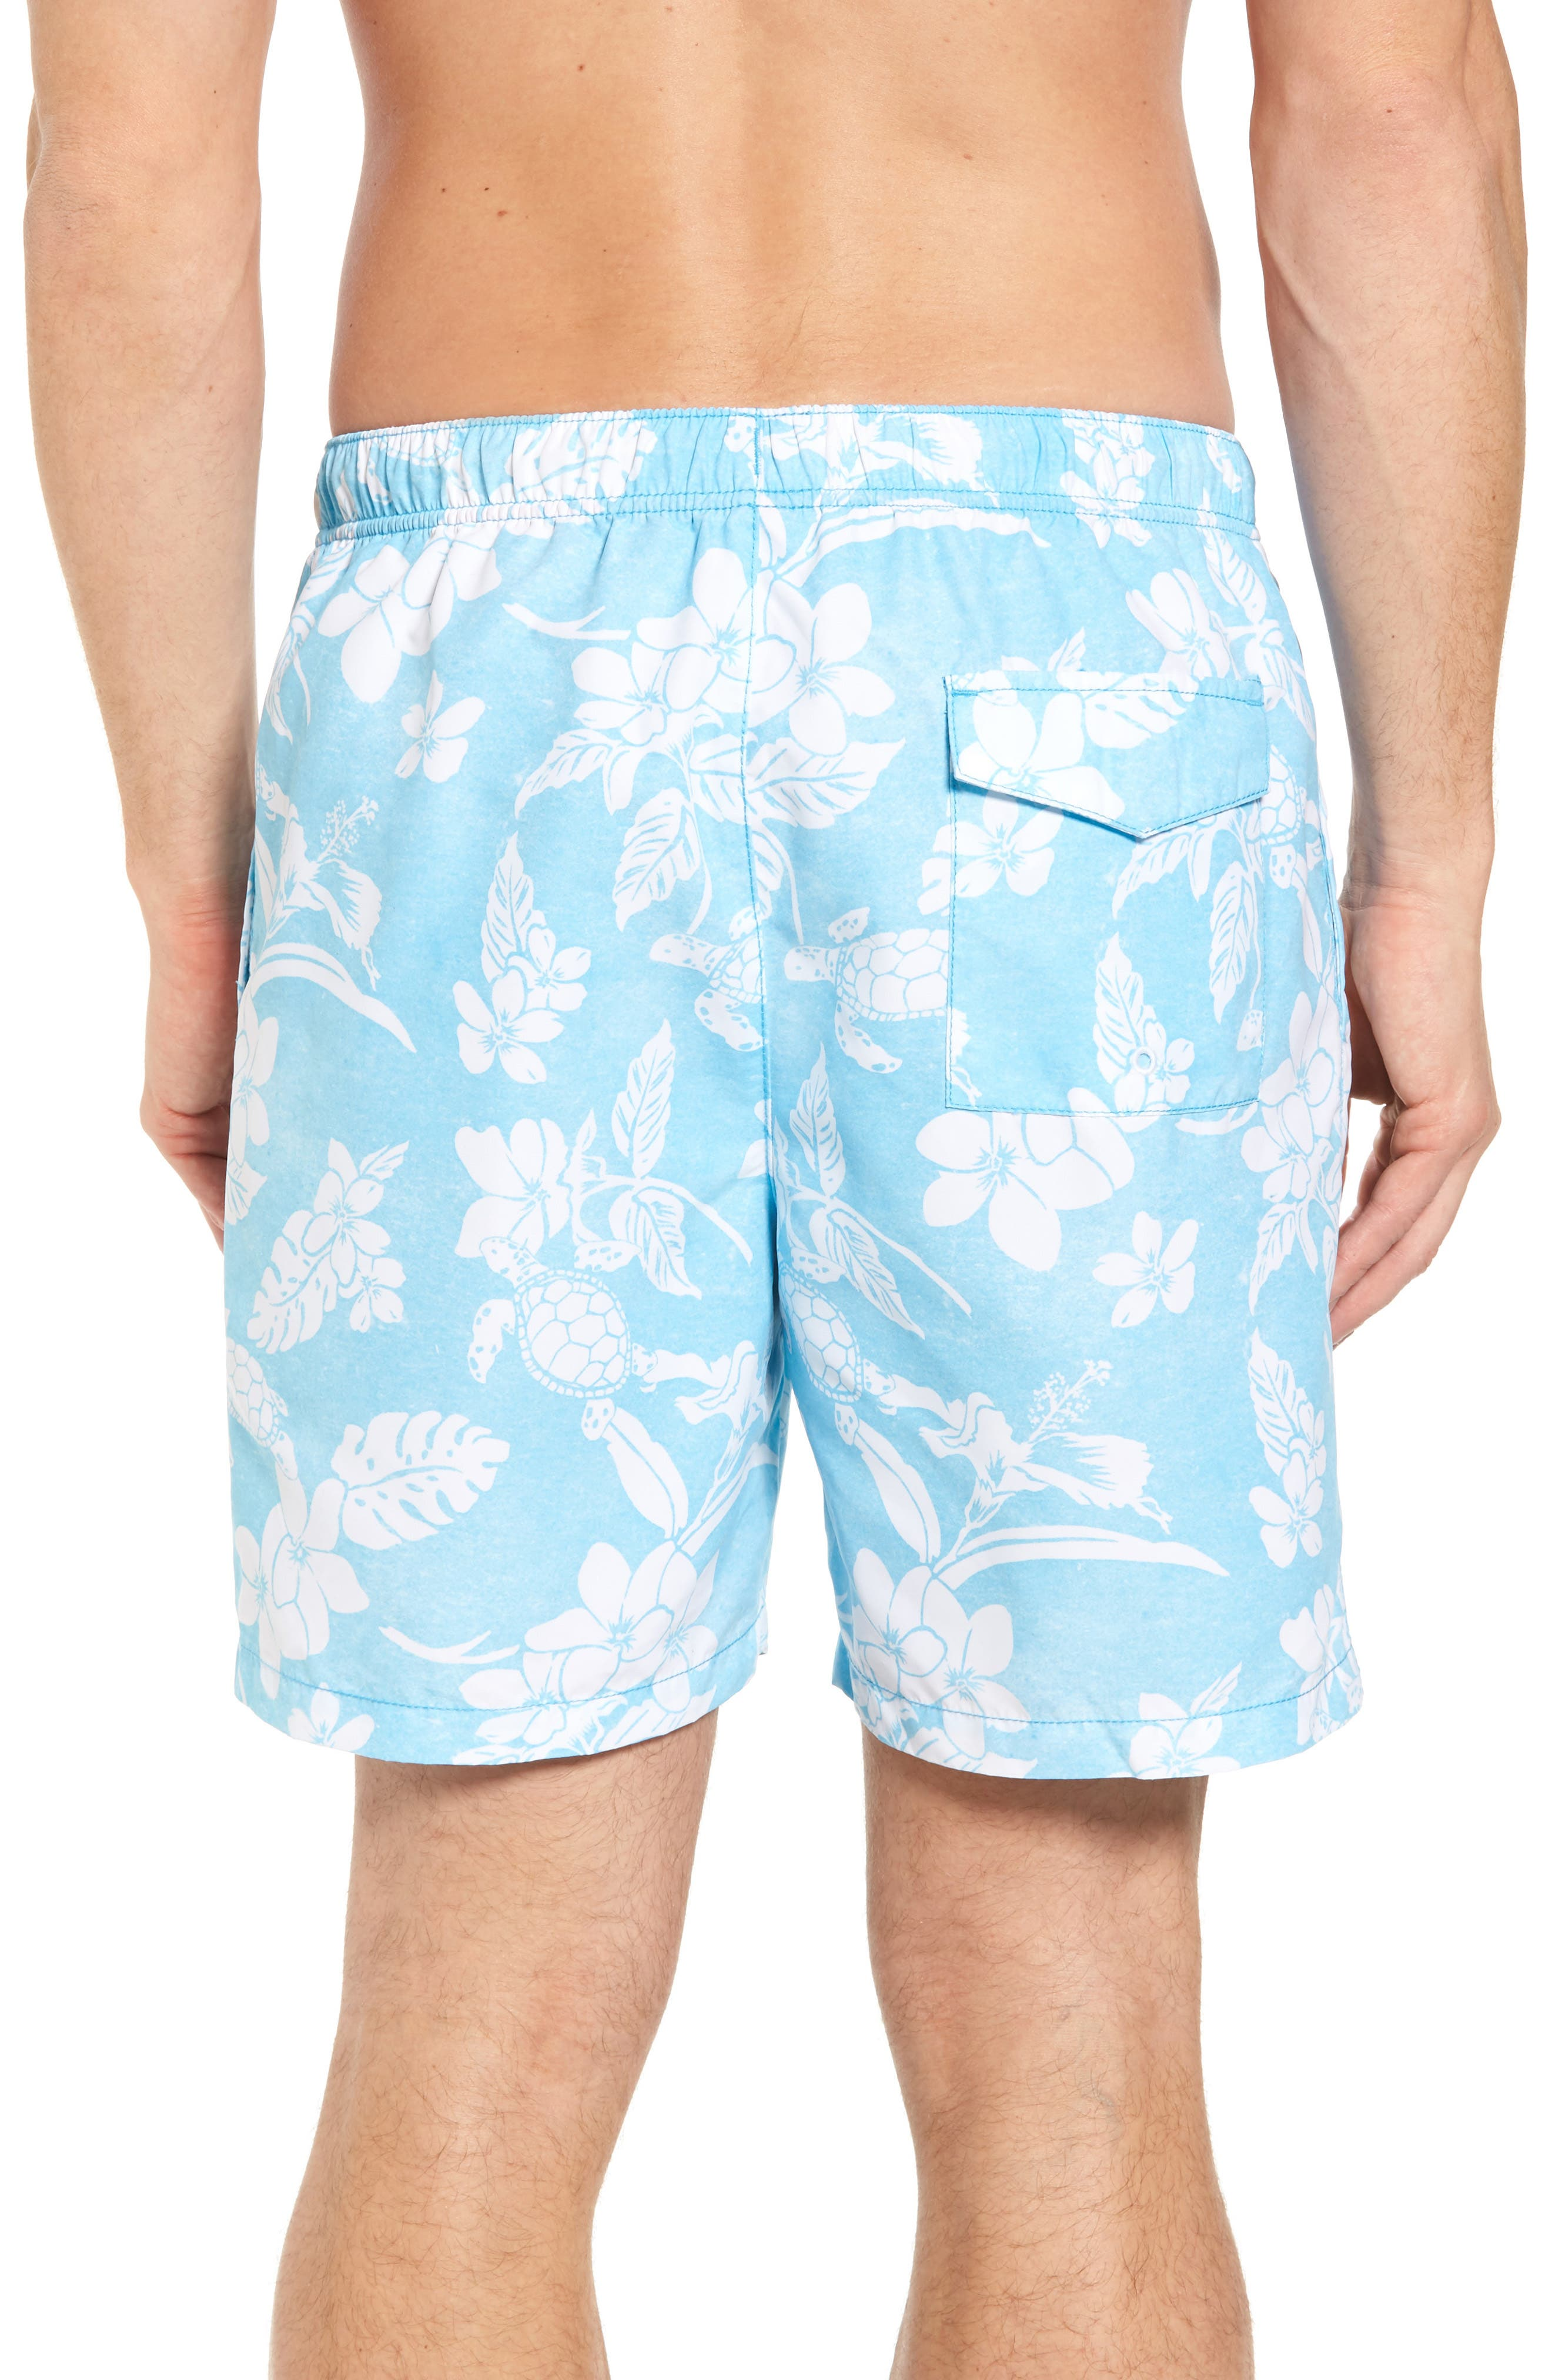 Naples Turtle Beach Swim Trunks,                             Alternate thumbnail 2, color,                             Breeze Blue